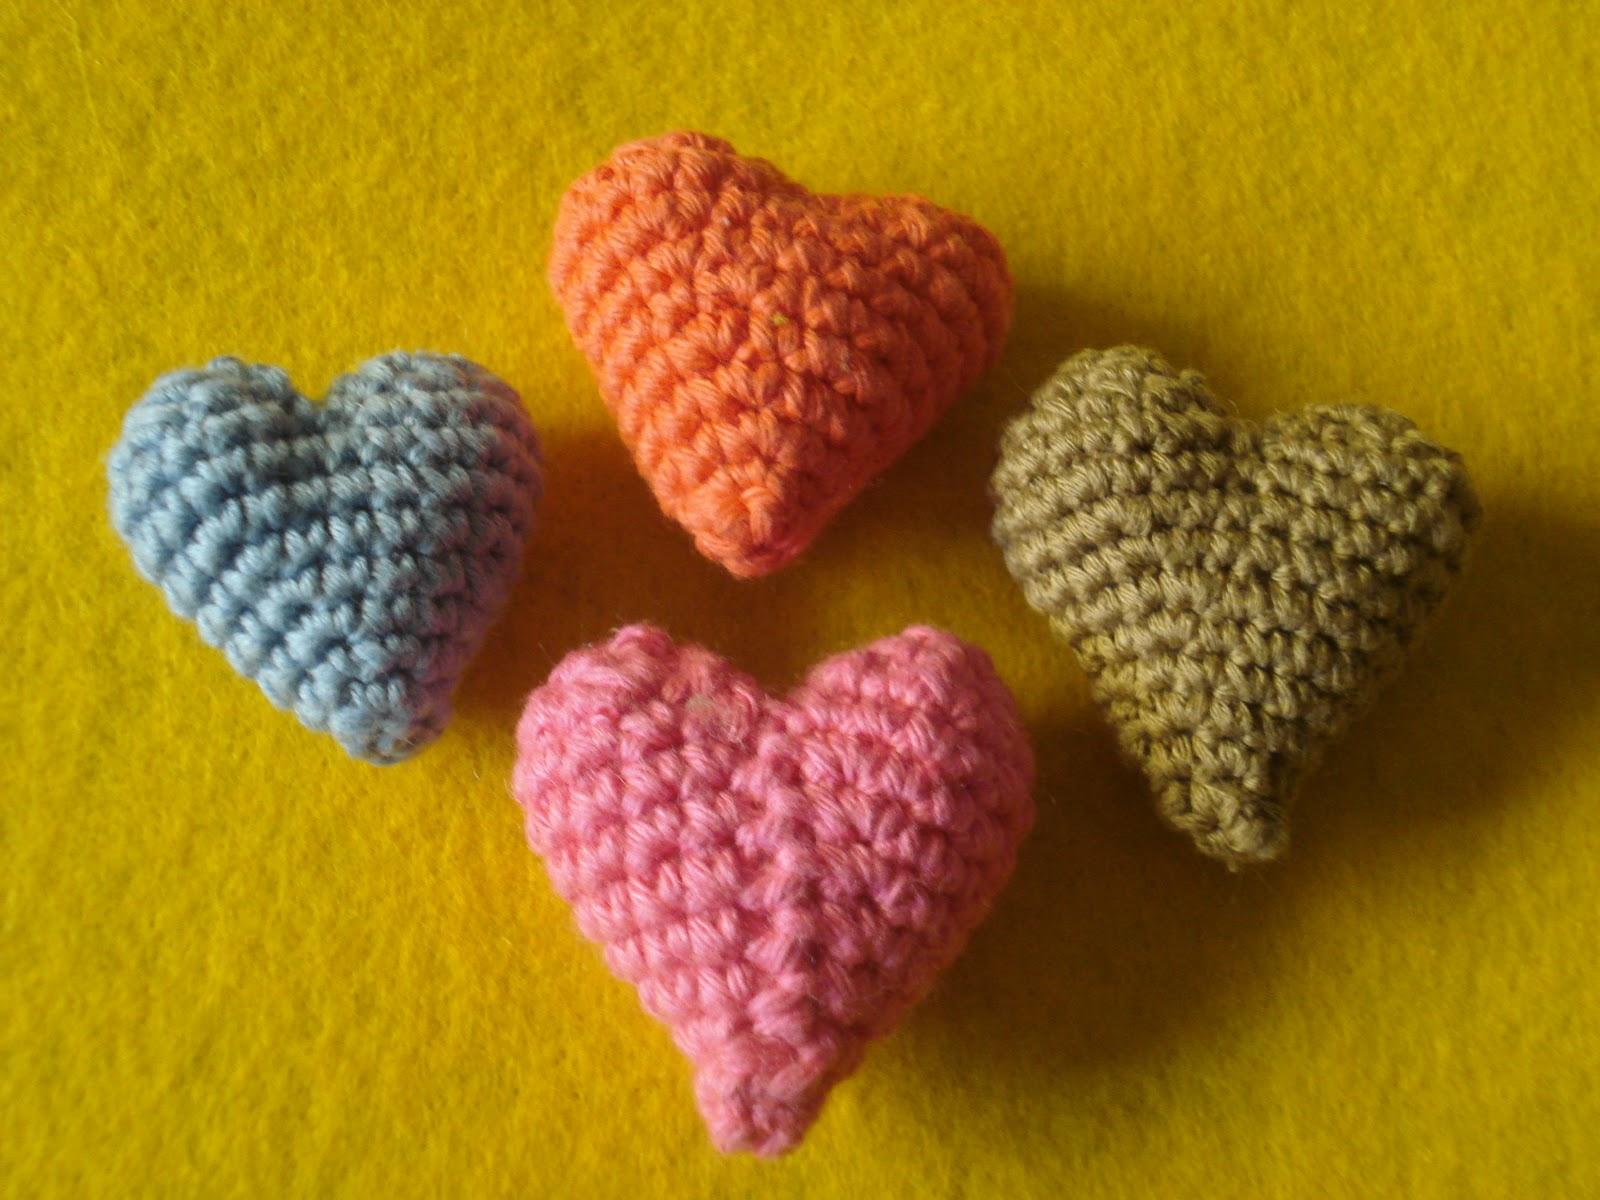 How do you crochet a where's waldo hat - The QA wiki